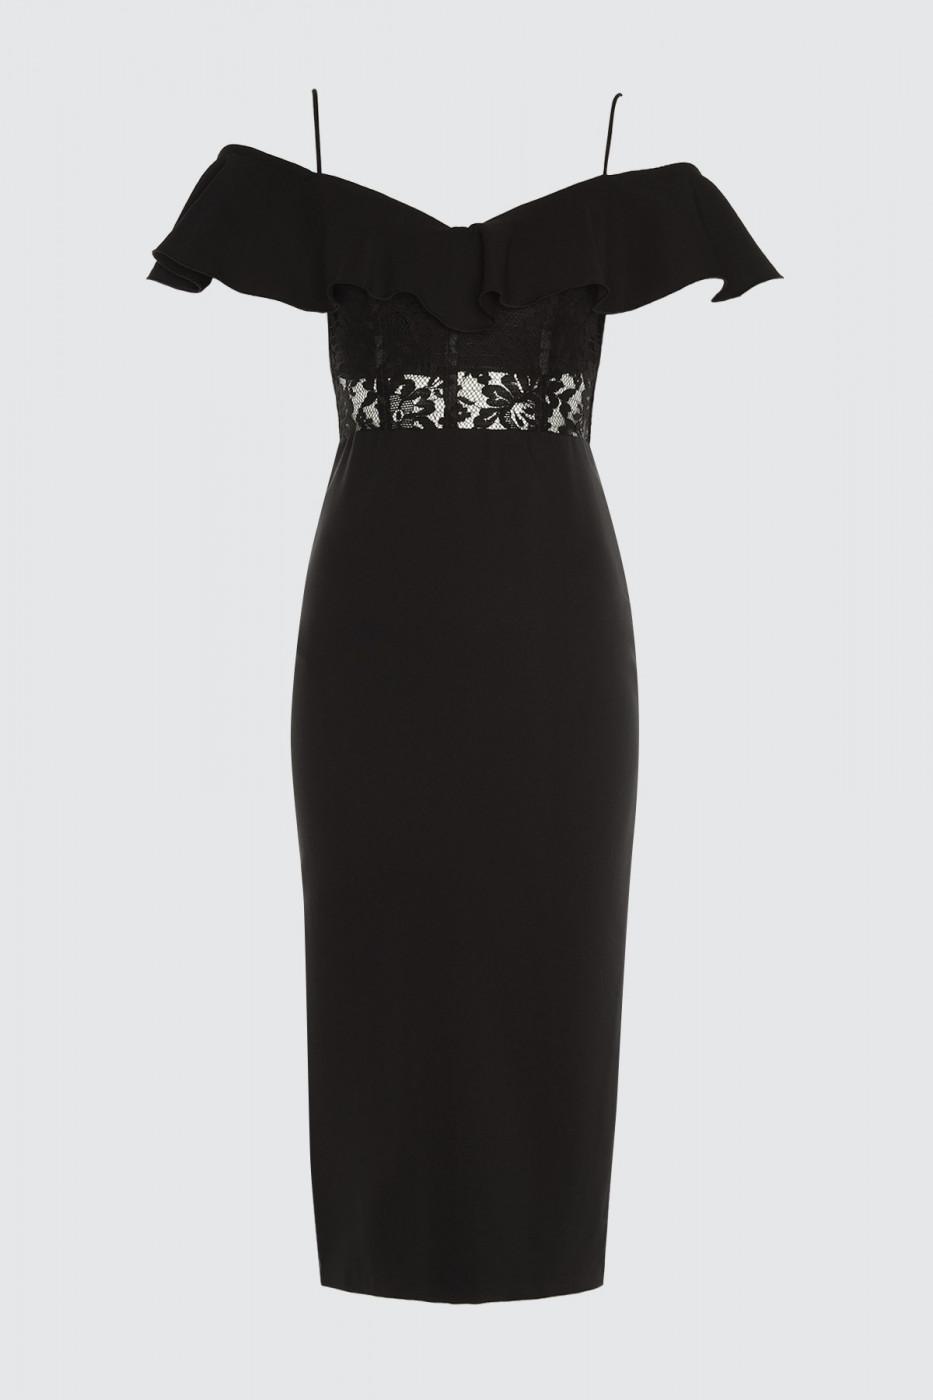 Trendyol Black Lace Detailed Corset Dress